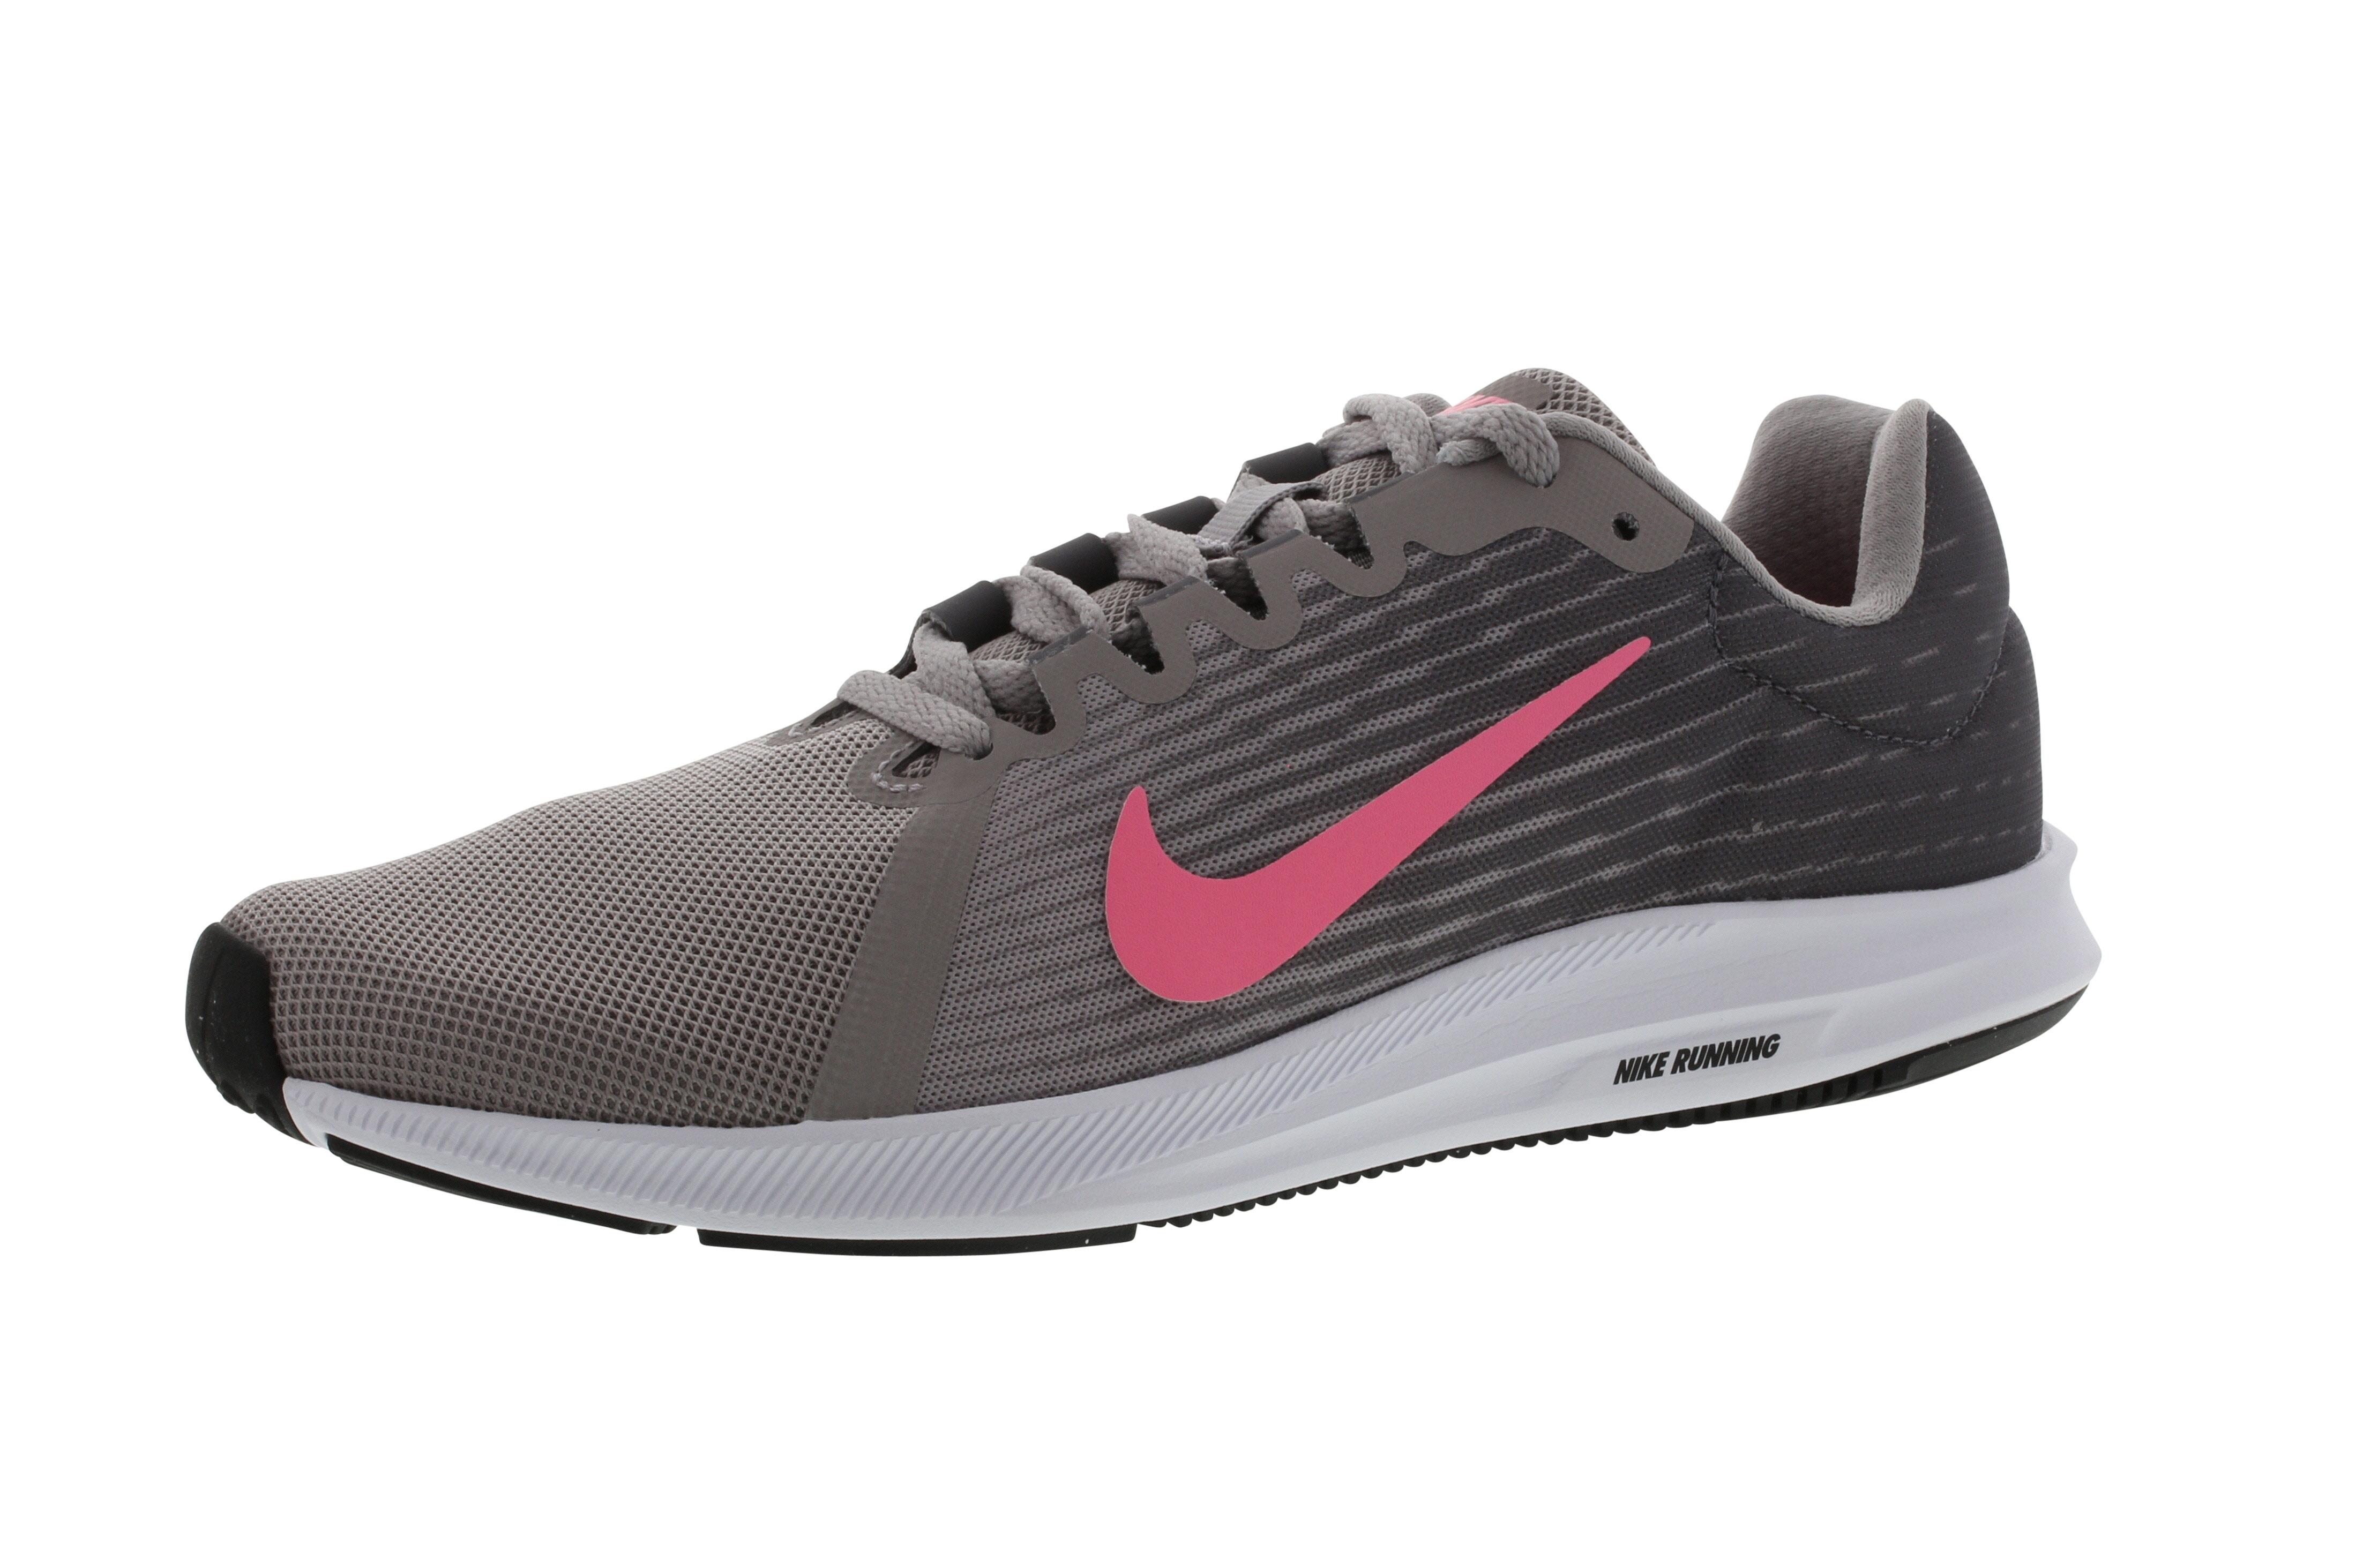 f45dd2a94b24b Nike Downshifter 8 - Running shoes for Women - Grey | 21RUN